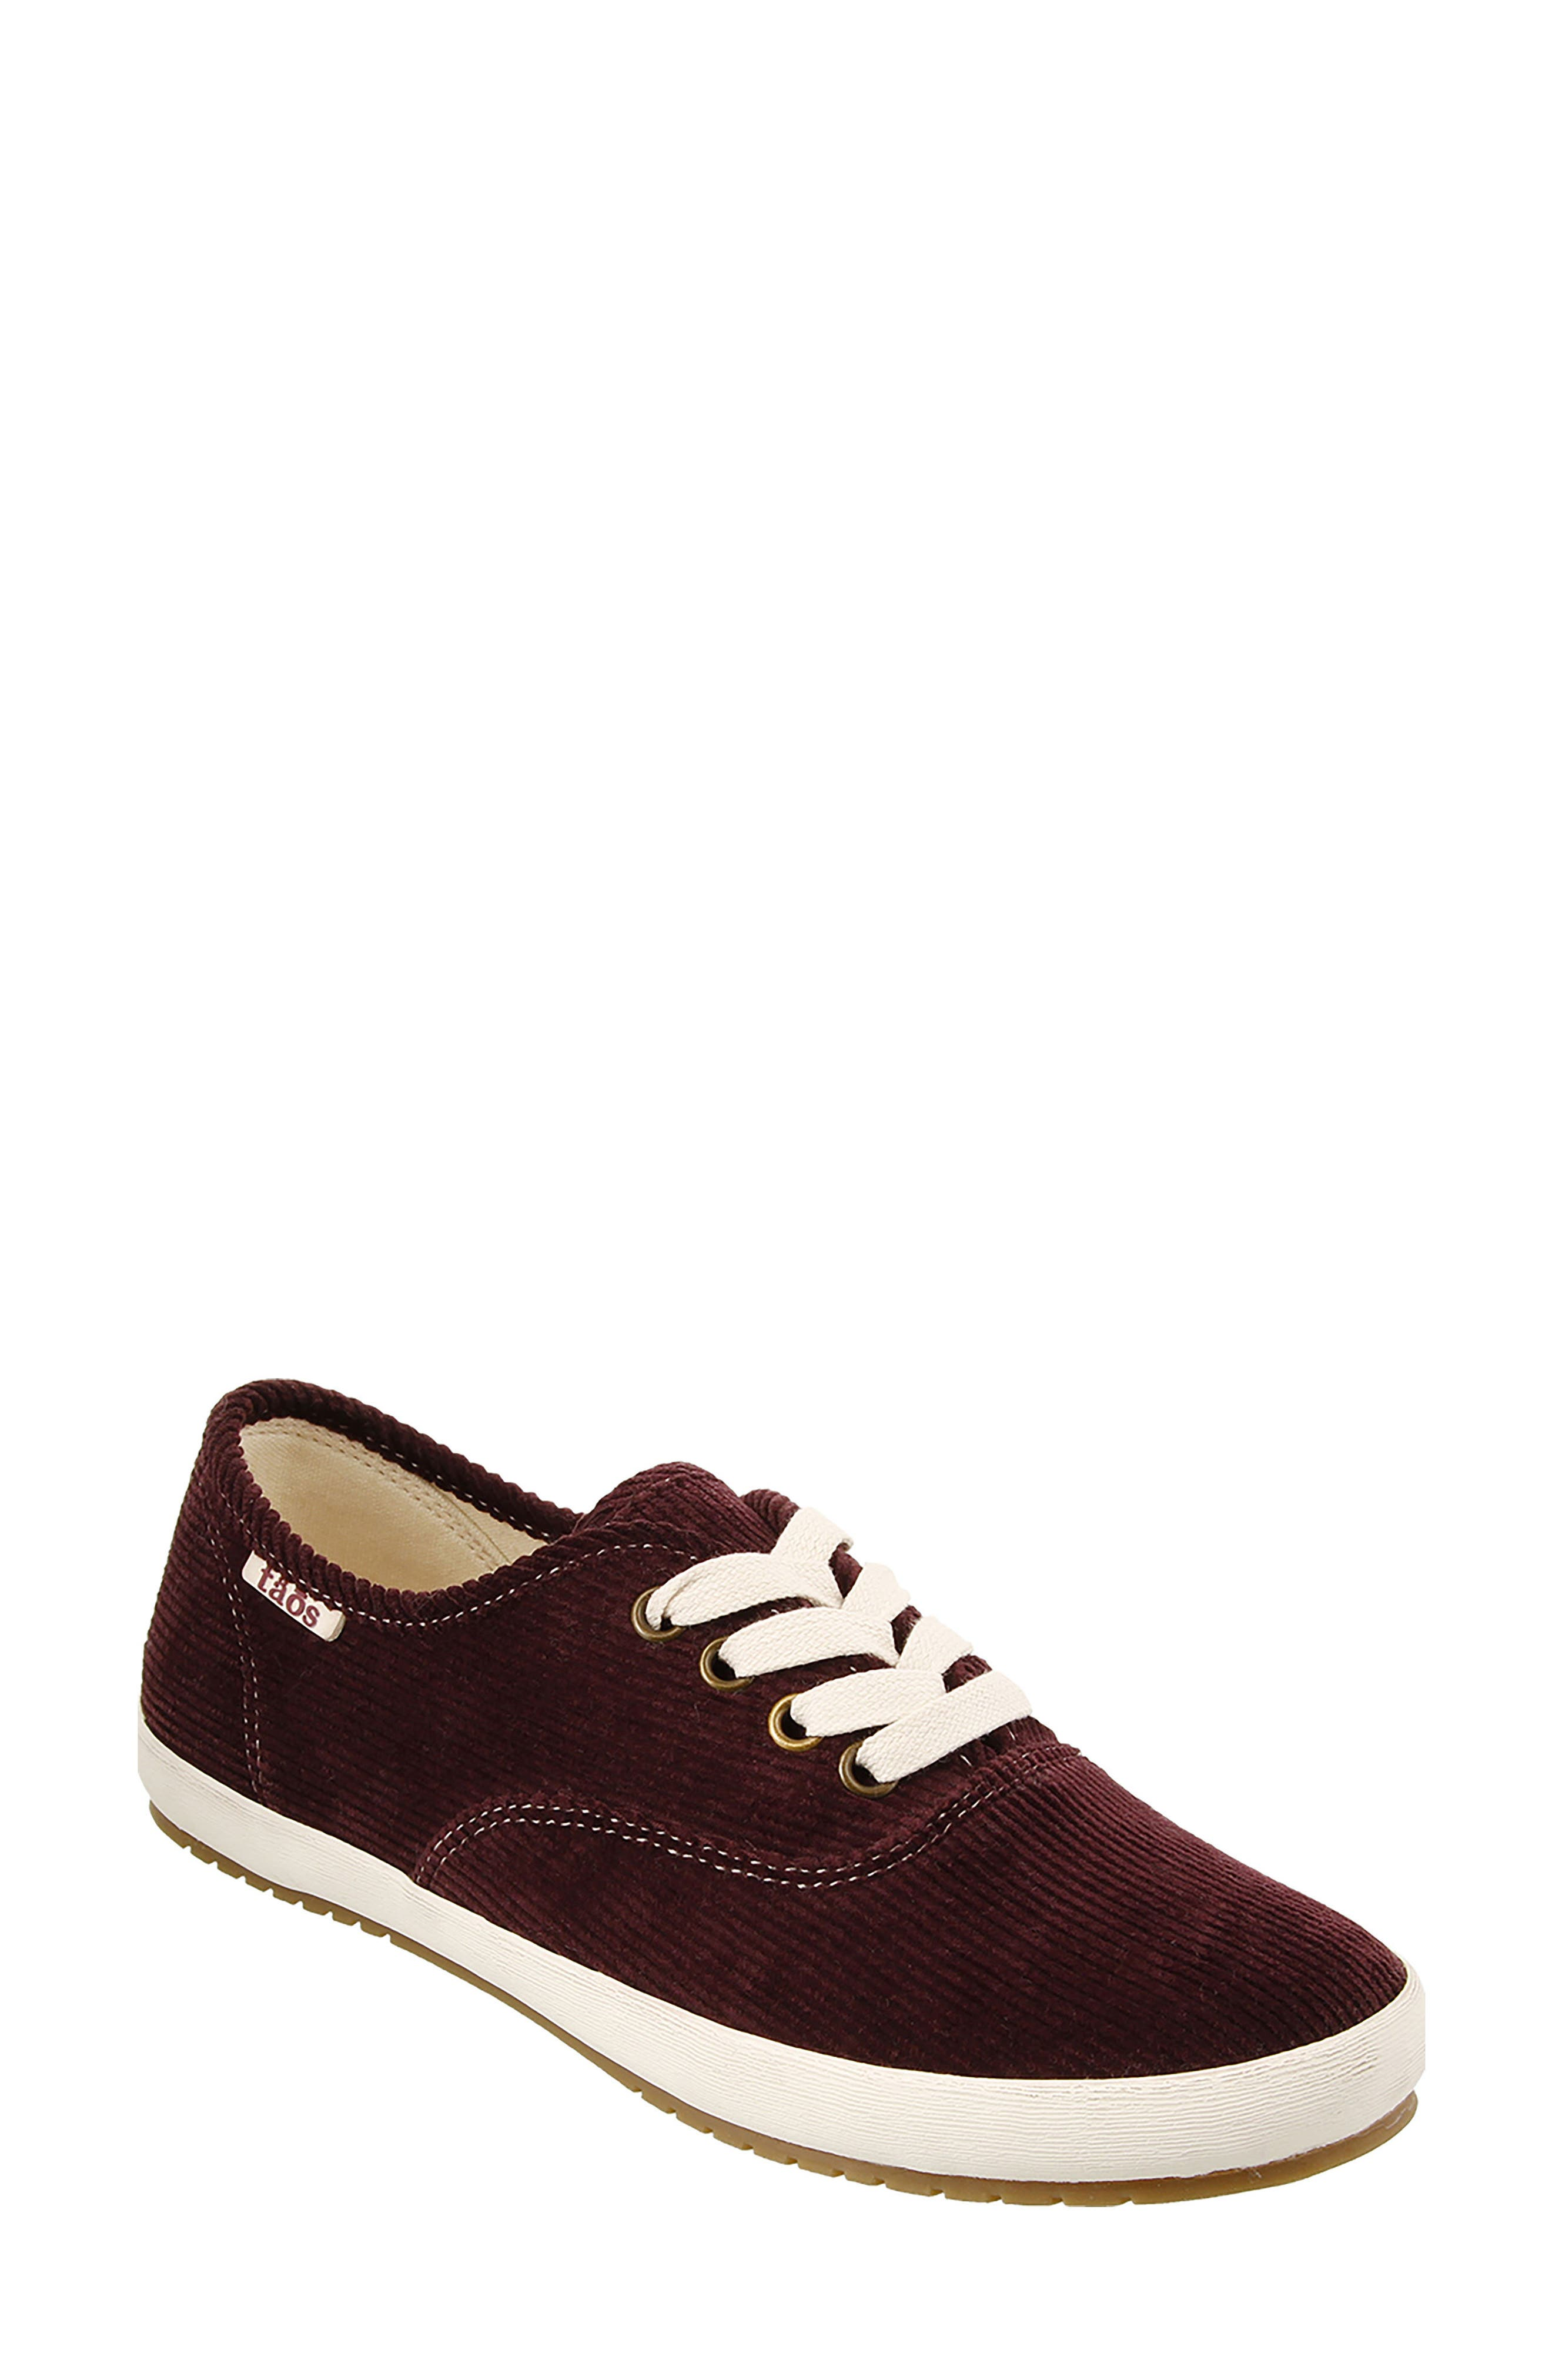 Guest Star Sneaker,                         Main,                         color, Bordeaux Cord Fabric